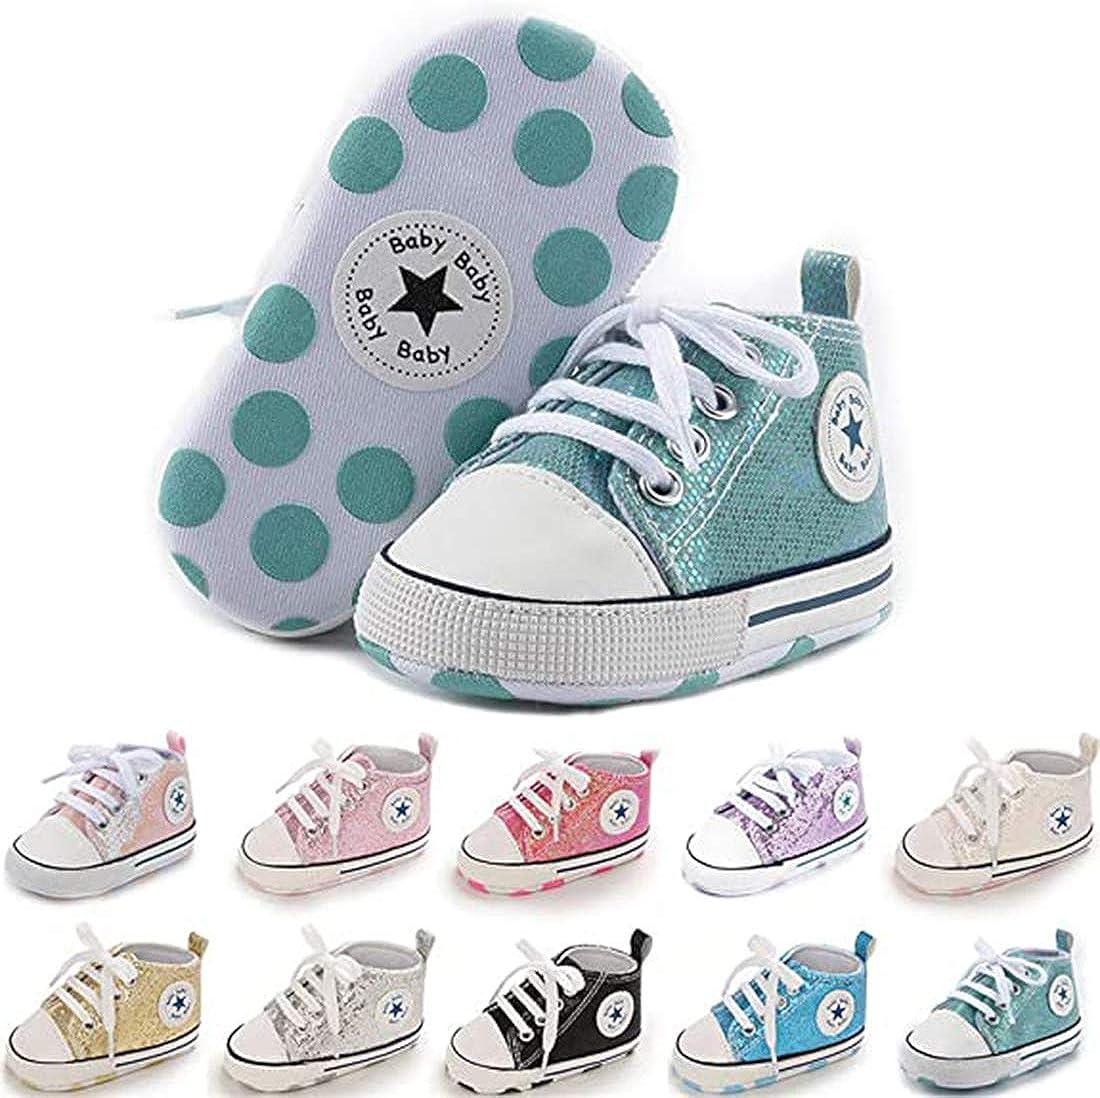 SABATUTU Unisex Baby Boys Girls Shoes Star High Top Ankle Toddler Sneaker Soft Anti-Slip Sole Newborn Infant First Walkers Canvas Denim Crib Shoes (Sequins Green, 6-12 Months)